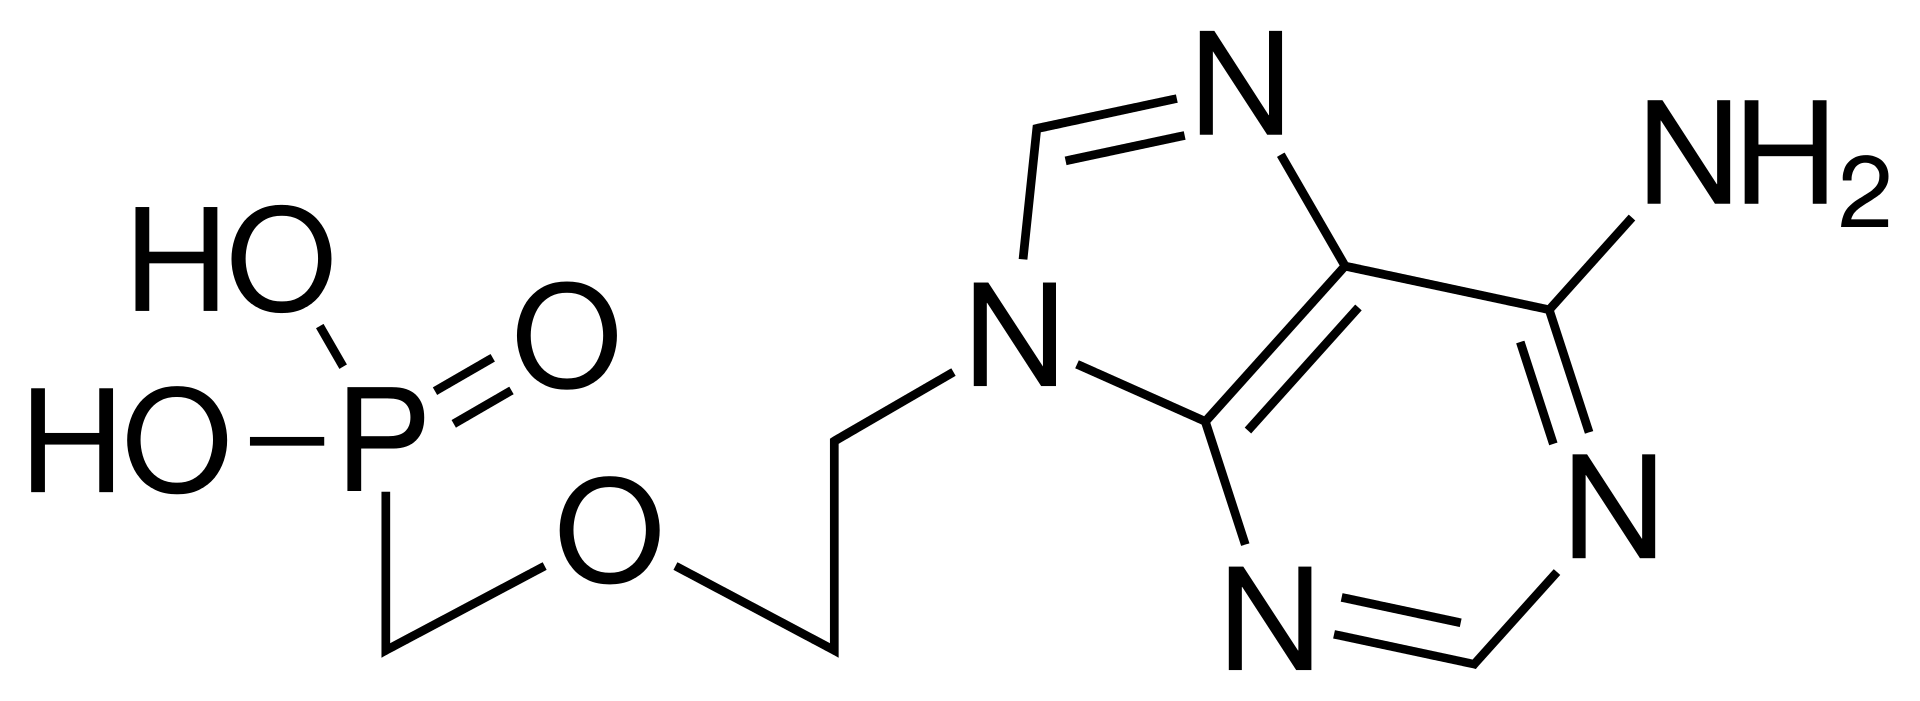 Key Difference Nucleoside vs Nucleotide Reverse Transcriptase Inhibitors